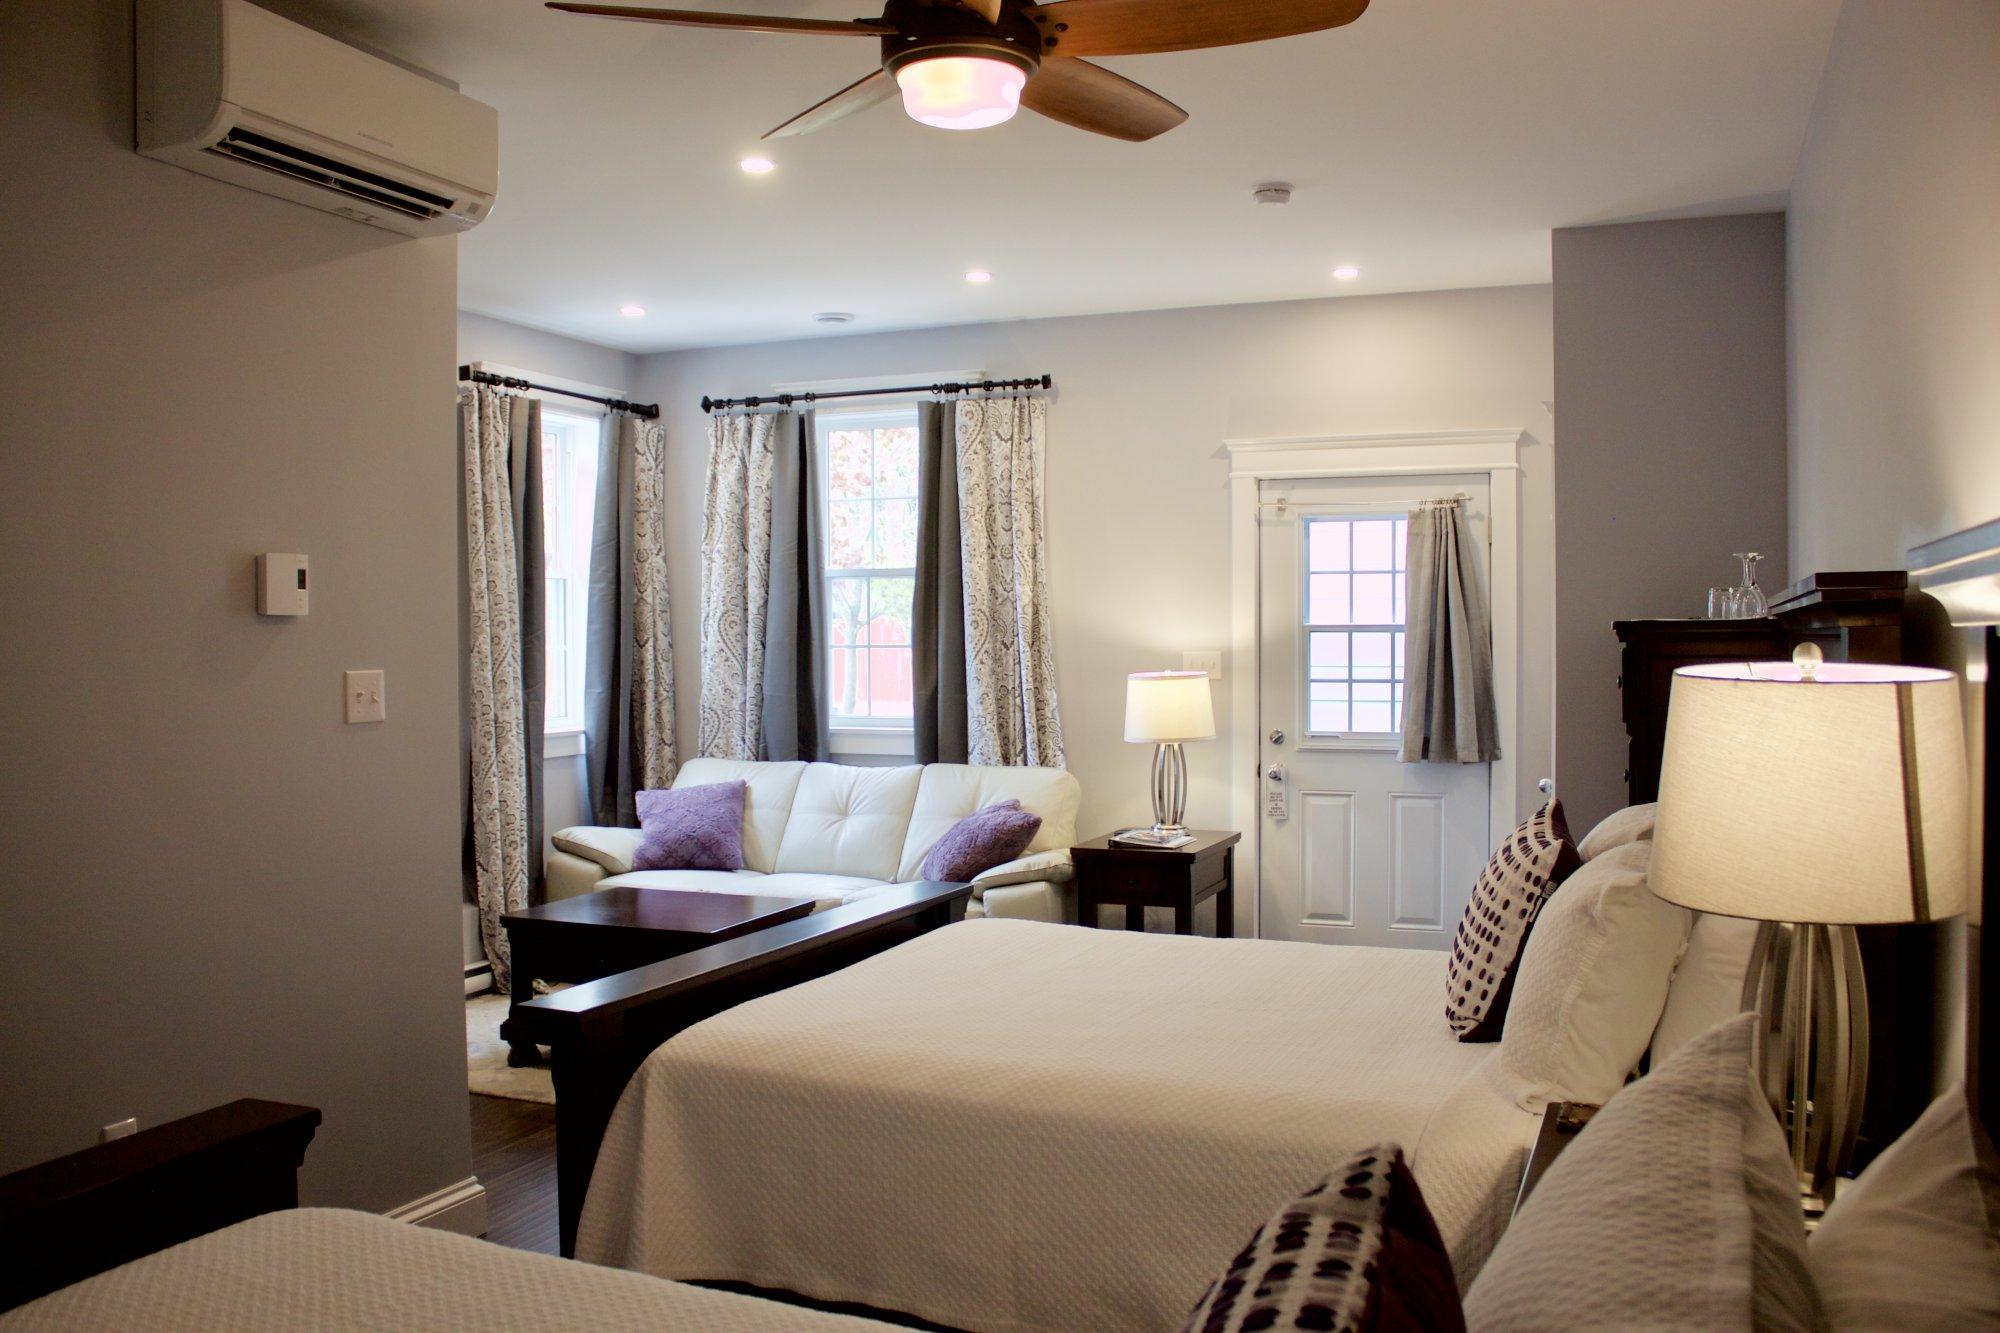 Room 11 at the Tattingstone Inn